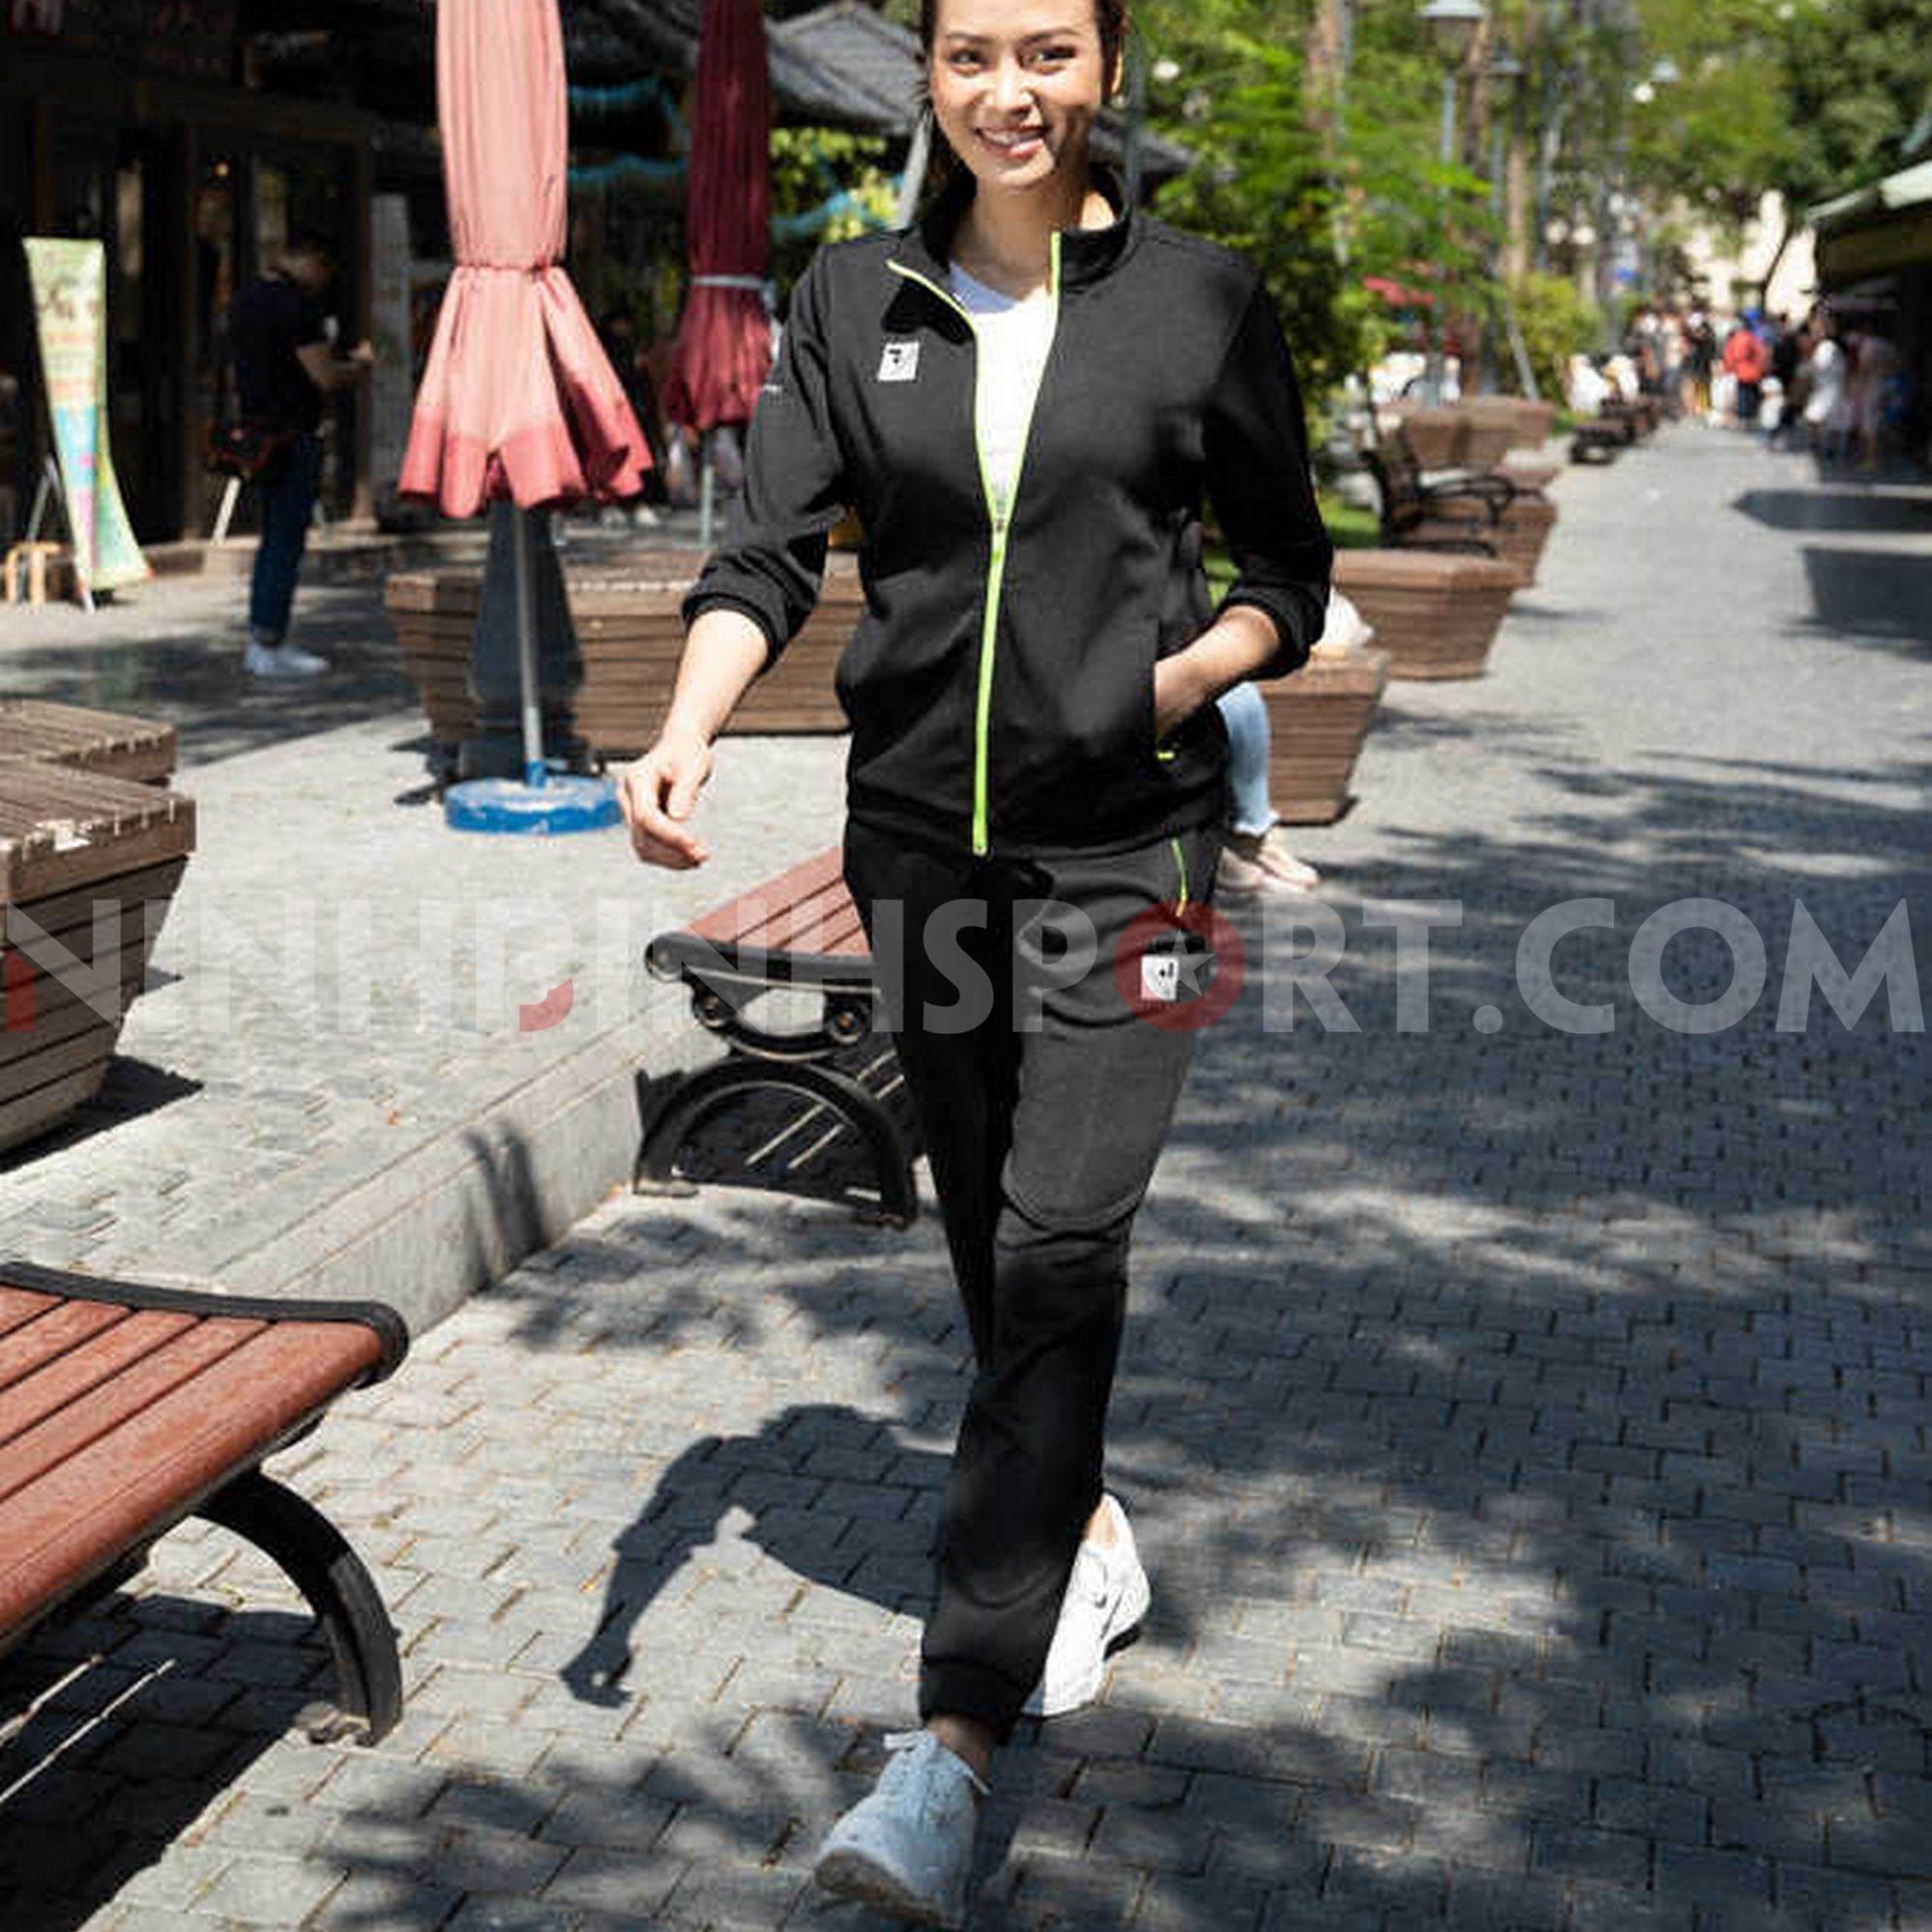 Quần thể thao nữ Donex AD-544-08